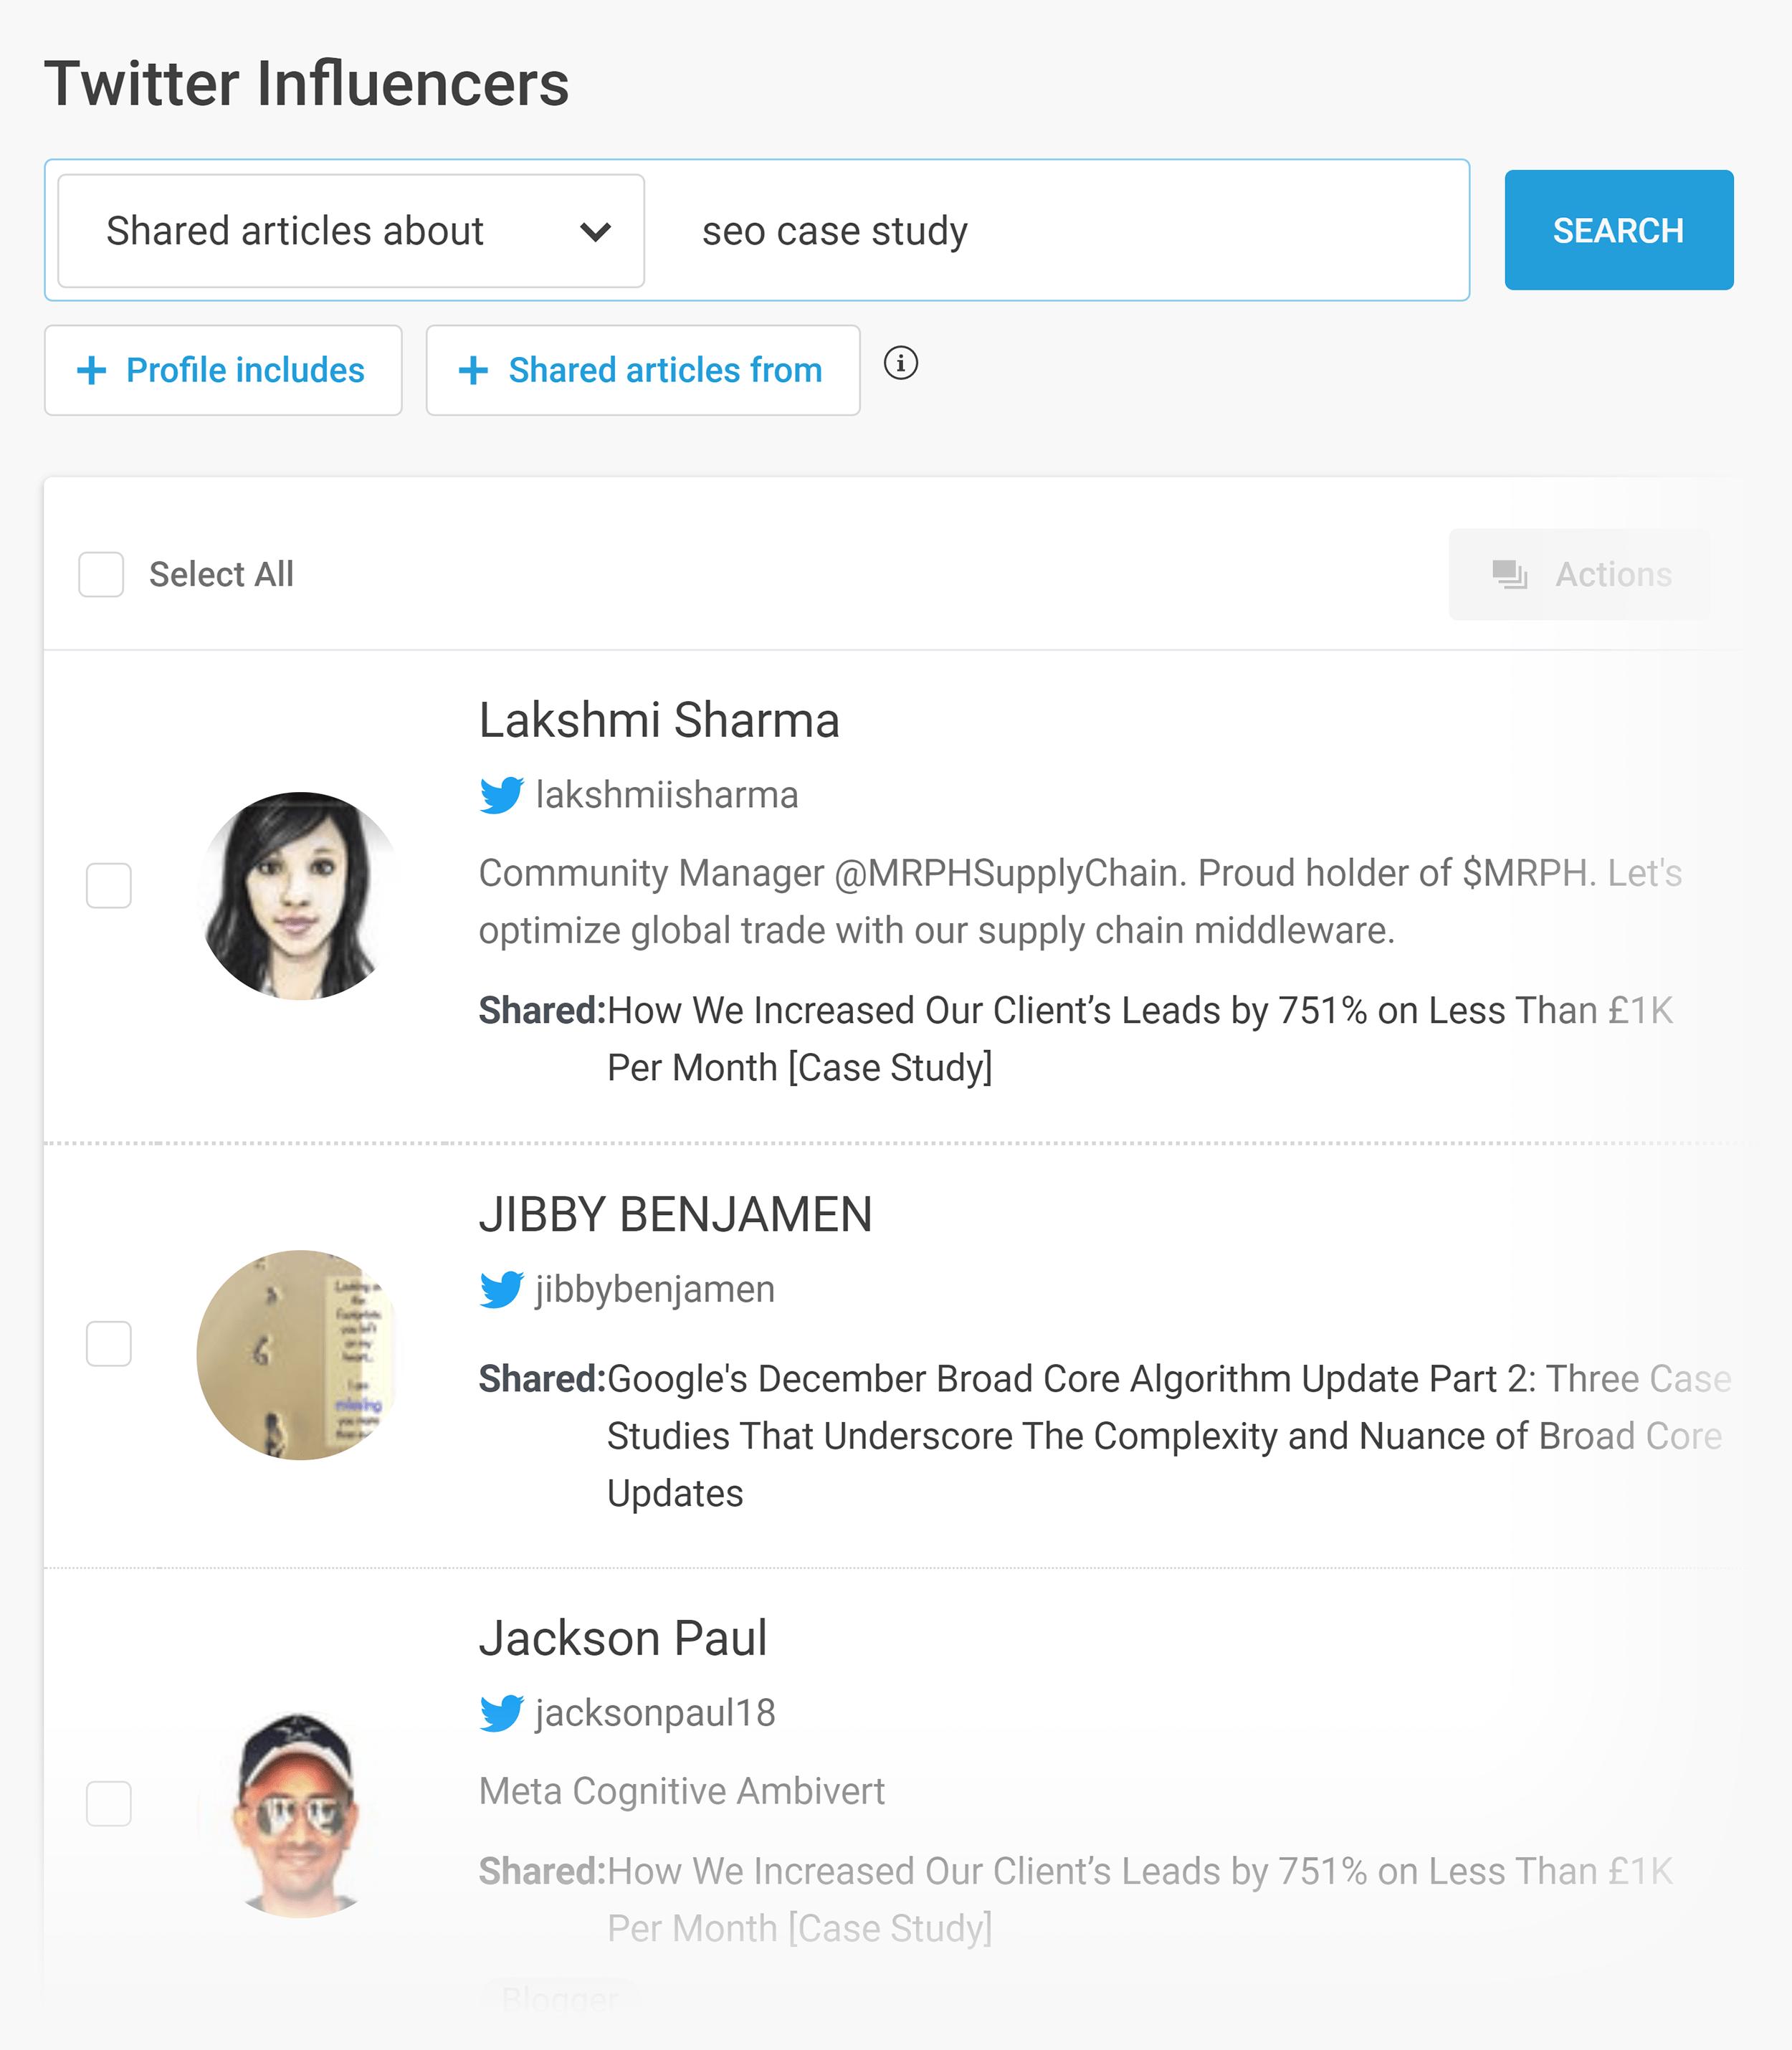 Buzzsumo – Influencers – Twitter – SEO case study